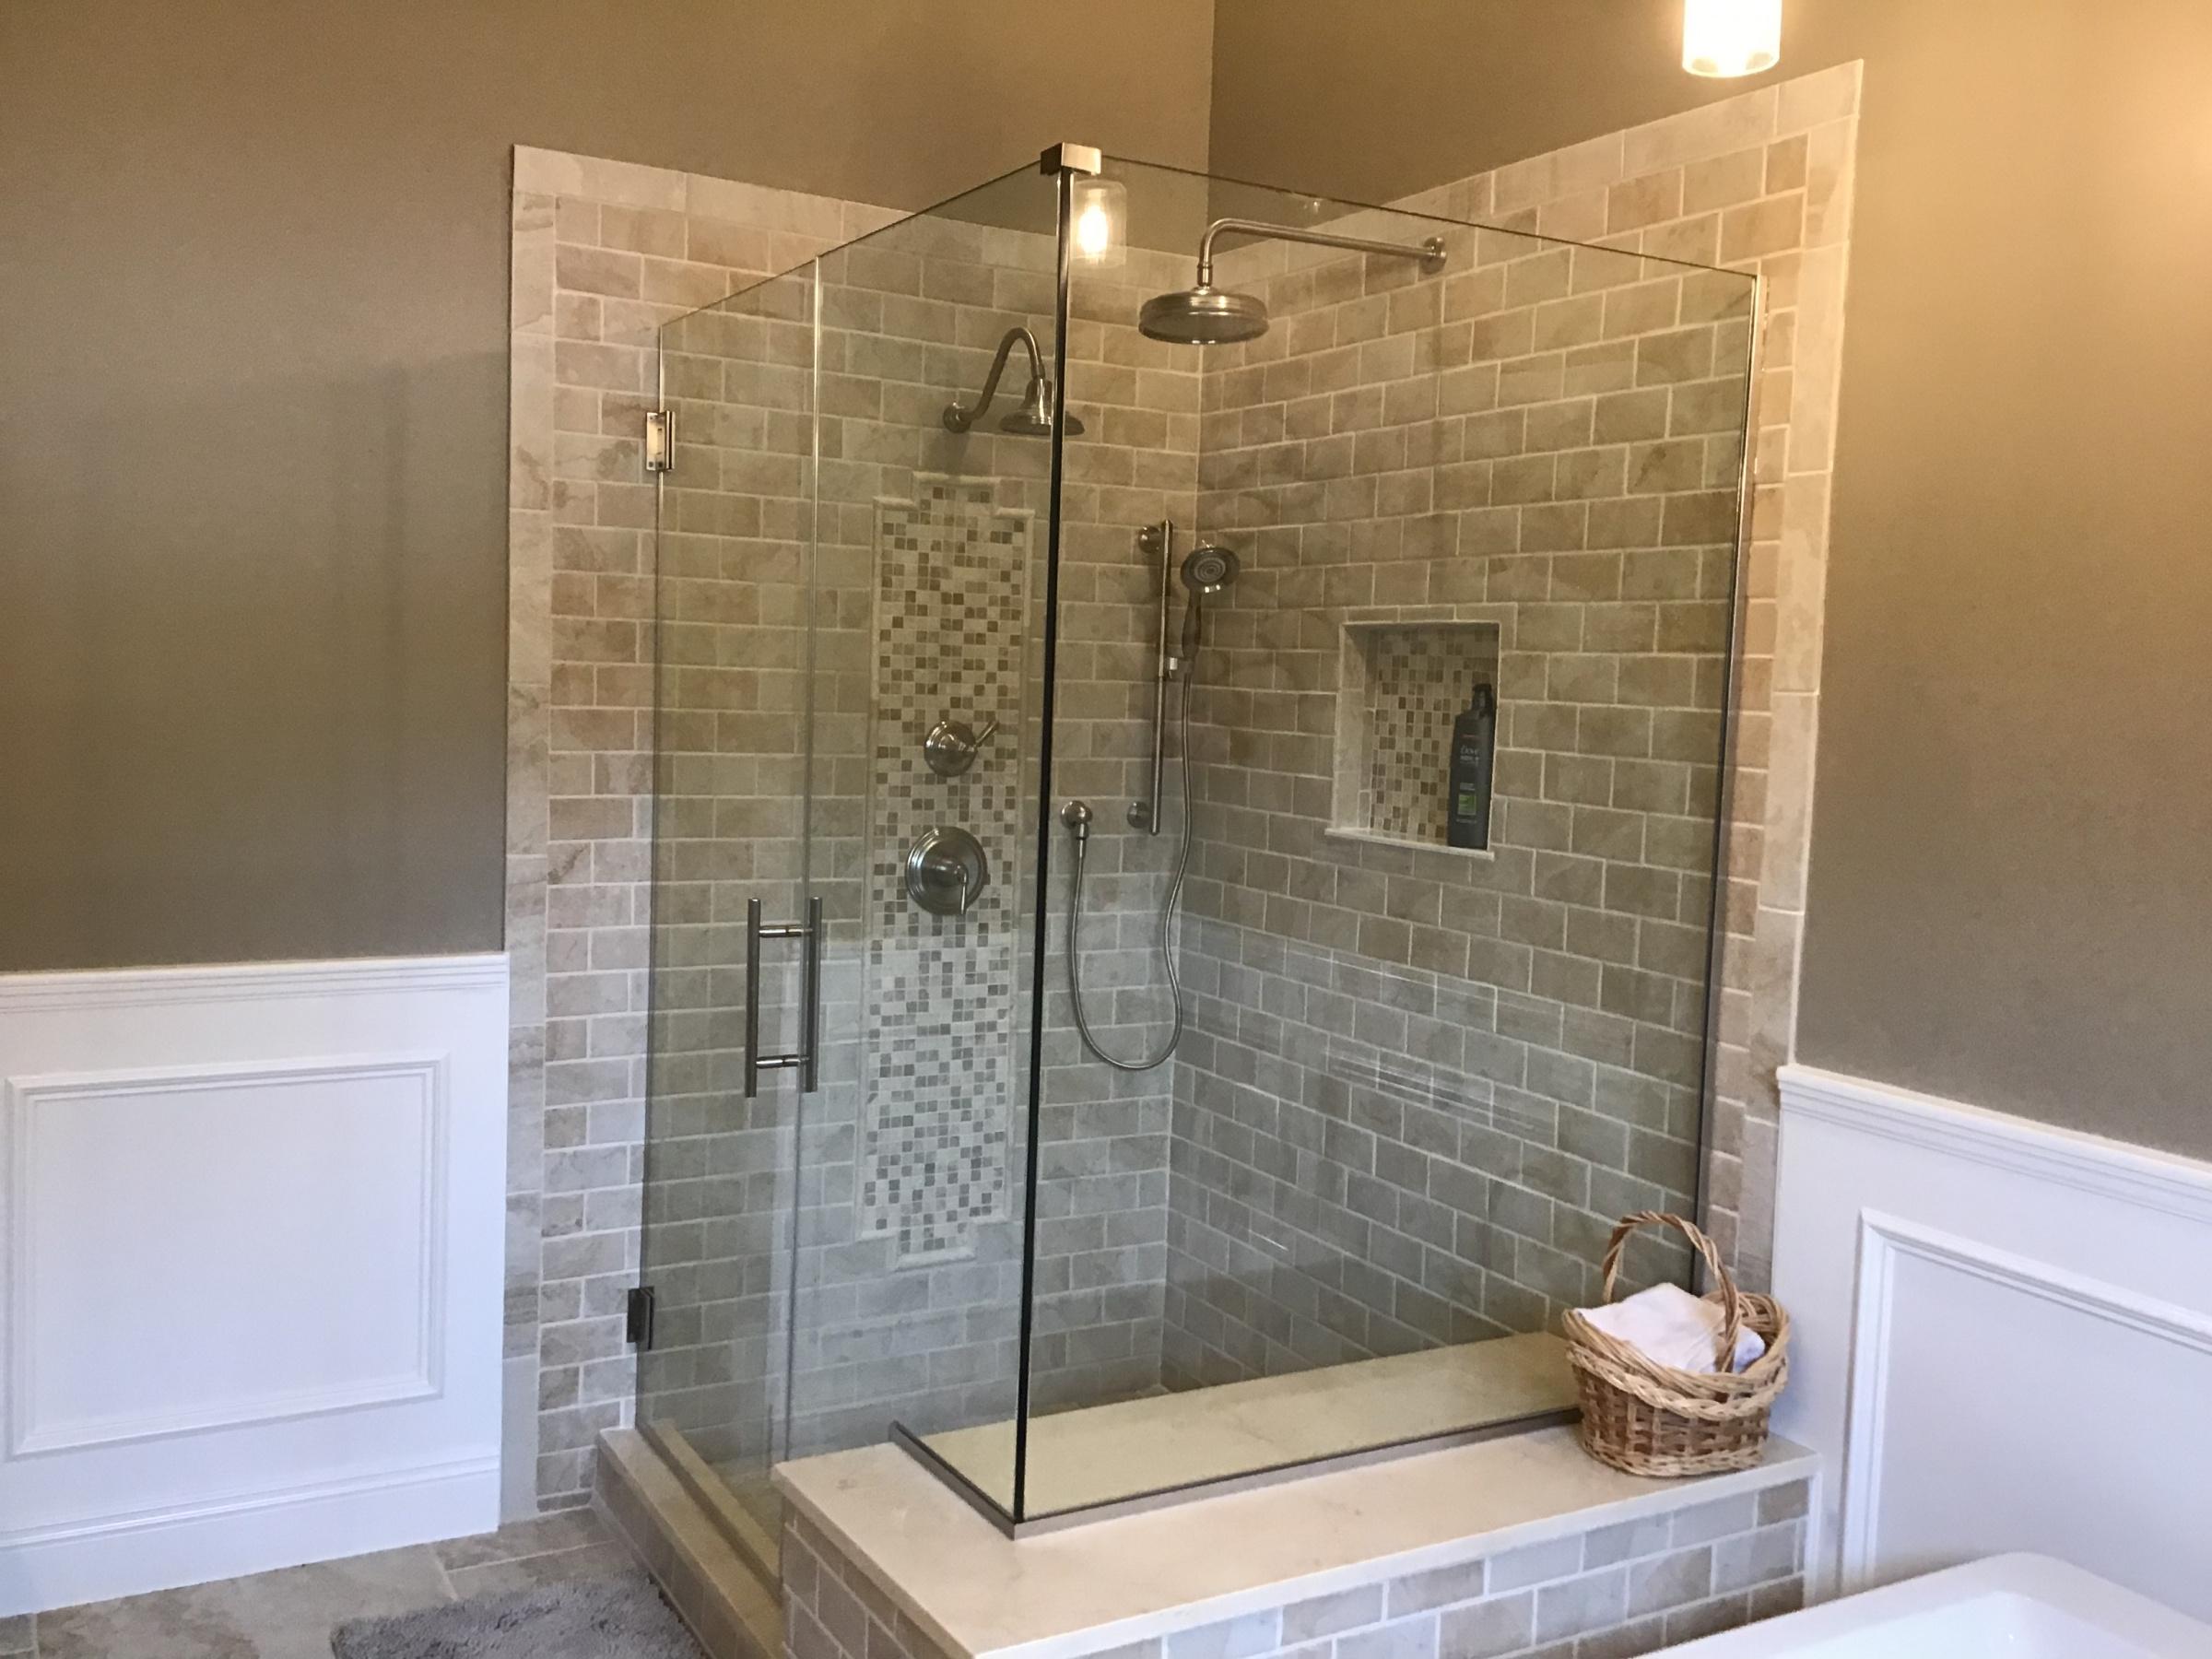 master bath in progress-e84a3741-59c9-48c9-a50a-3040caf05373.jpg